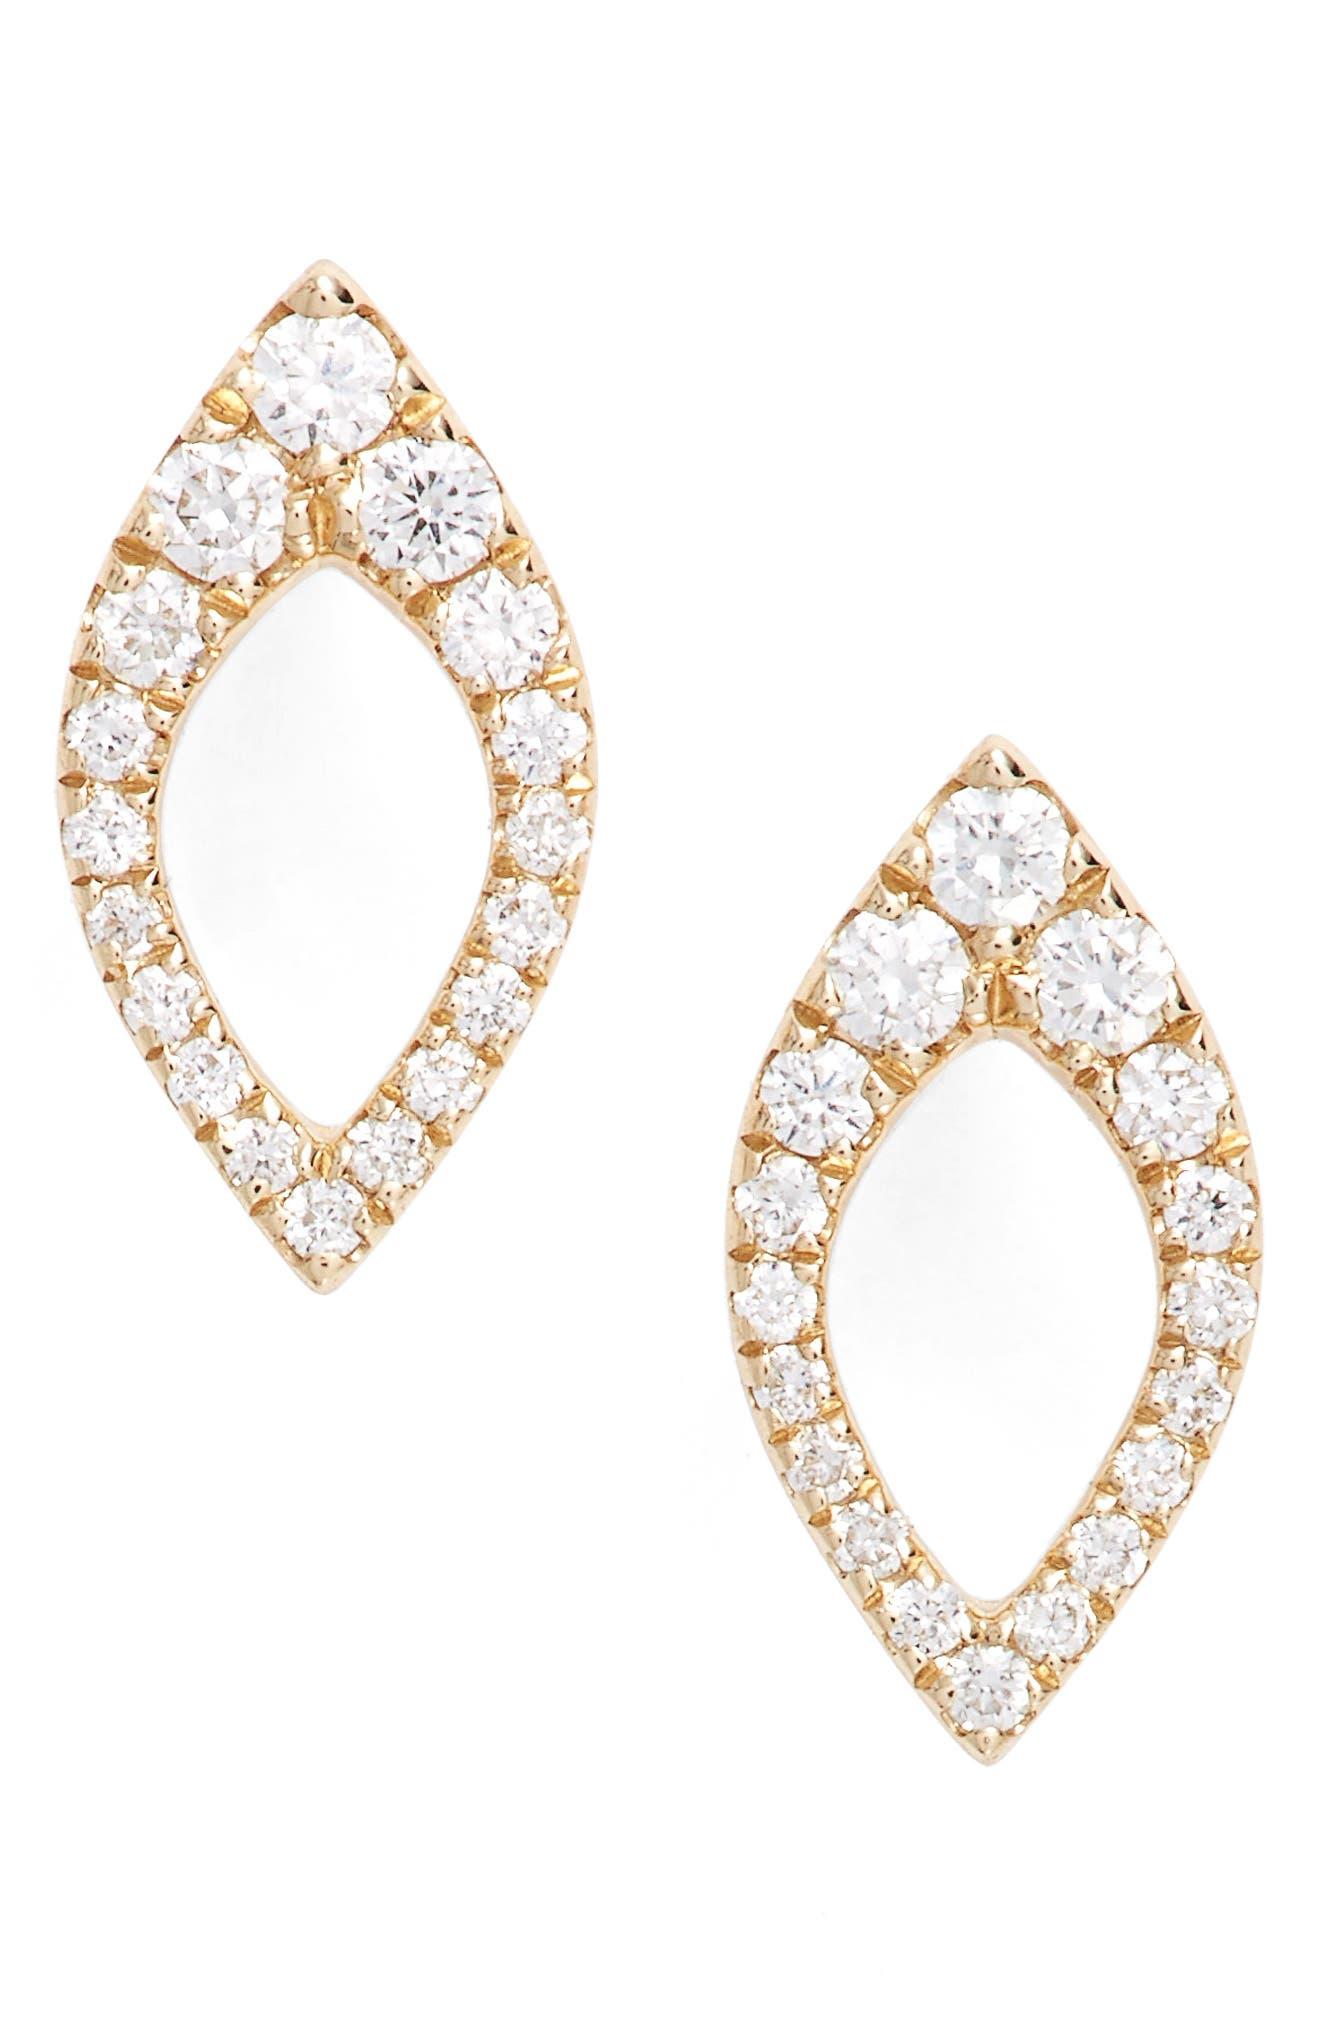 Alternate Image 1 Selected - Dana Rebecca Designs Marquise Diamond Studs